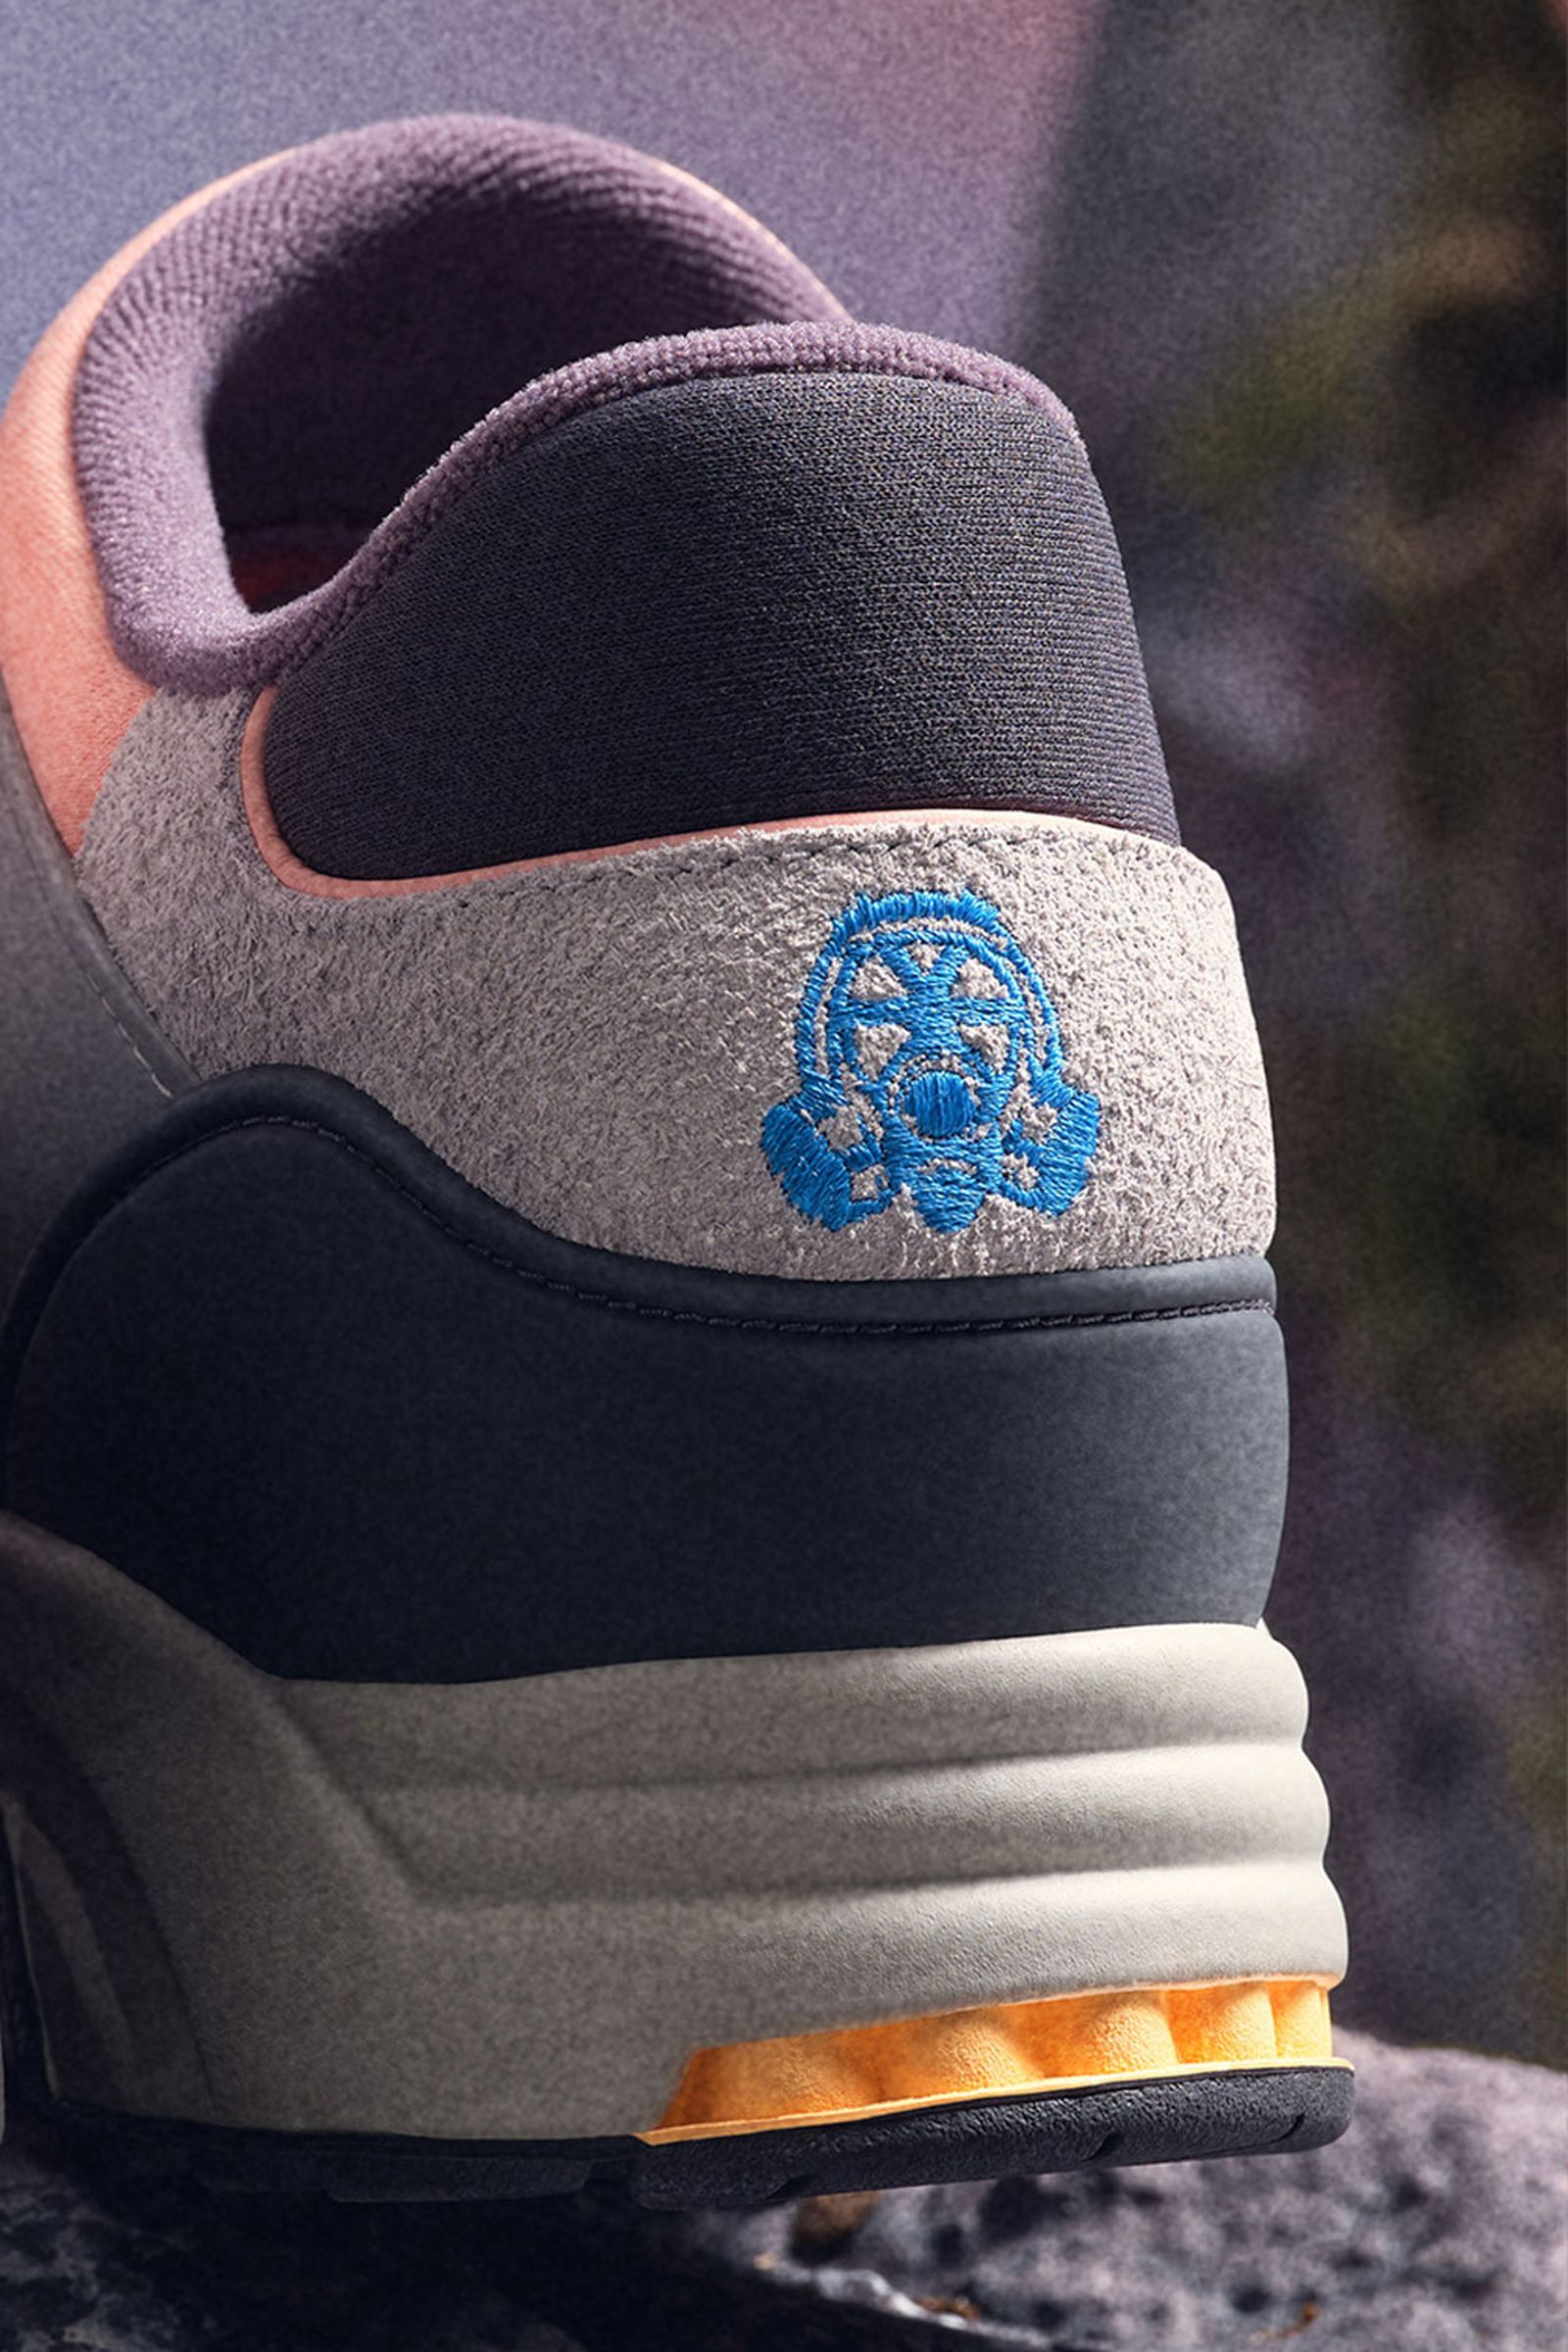 footpatrol-x-adidas-eqt-running-support-93-release-info-06